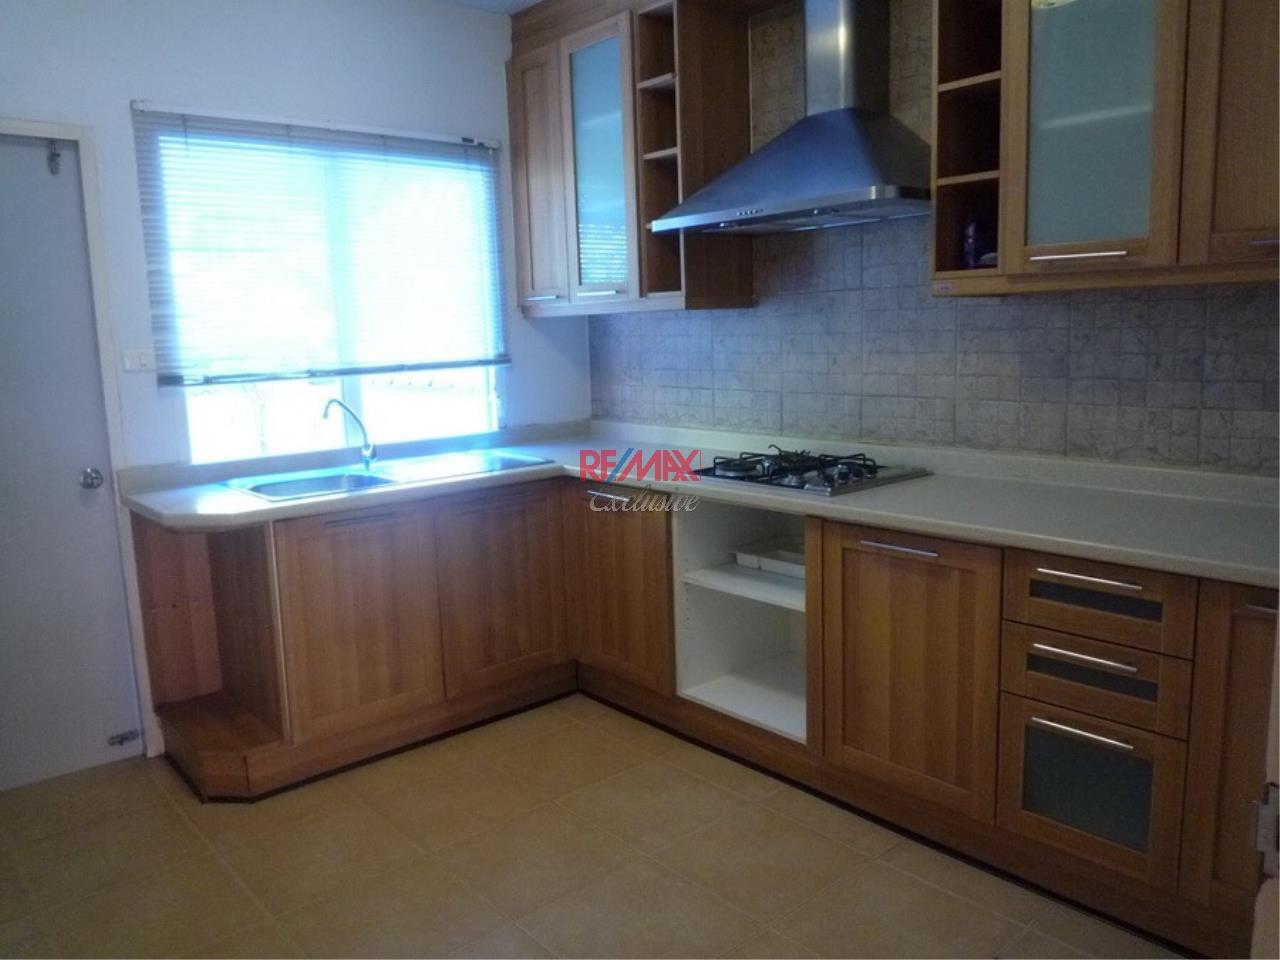 RE/MAX Exclusive Agency's Baan Klang Krung Thonglor 4 Bedrooms, 350 SQM., For Rent! 4